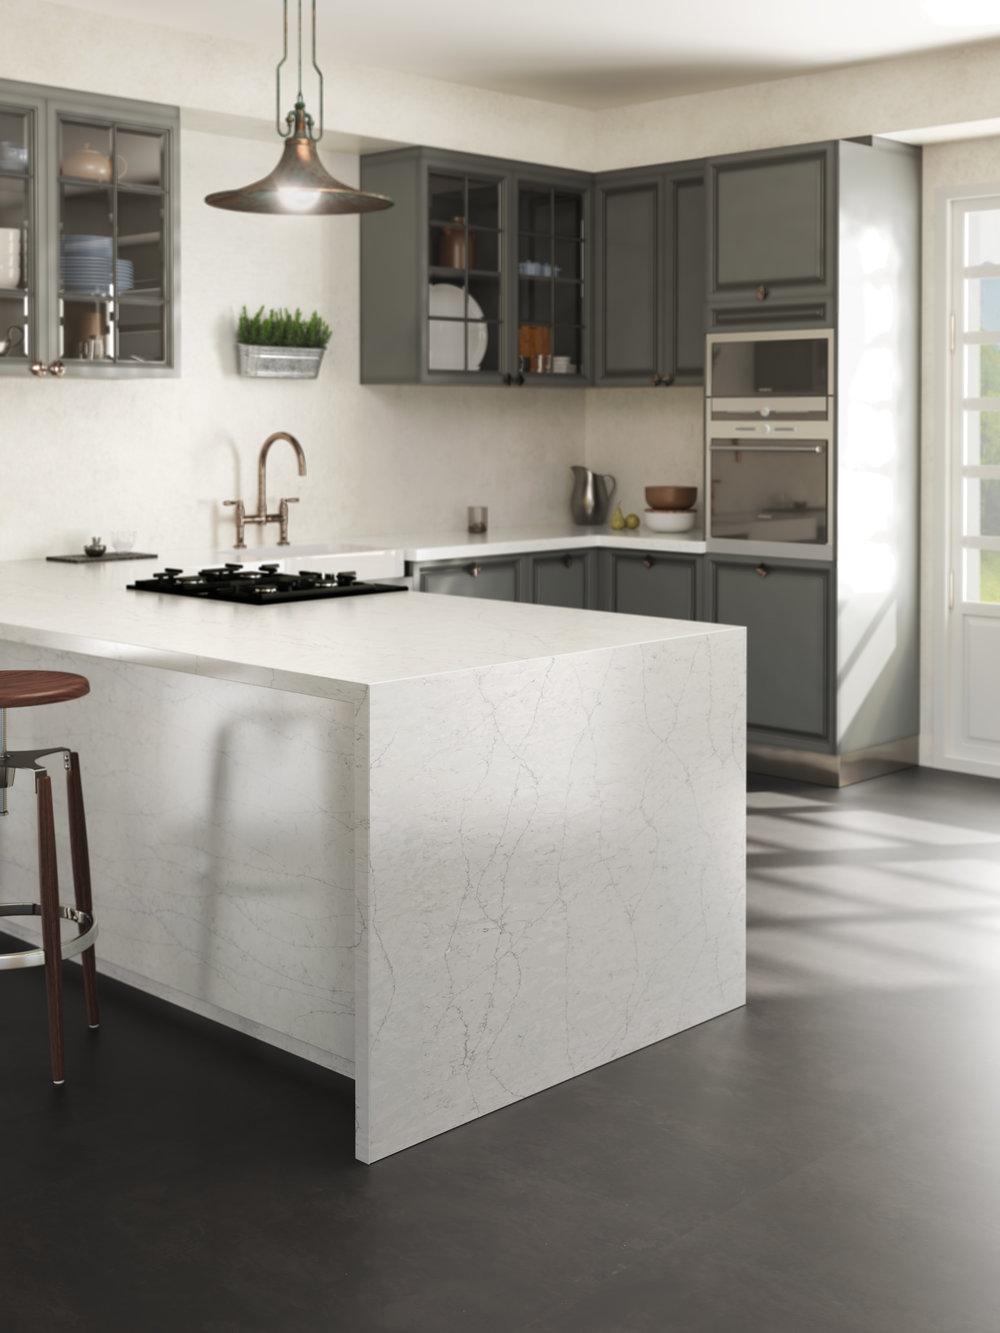 Silestone Kitchen 2 - Eternal Pearl Jasmine.jpg